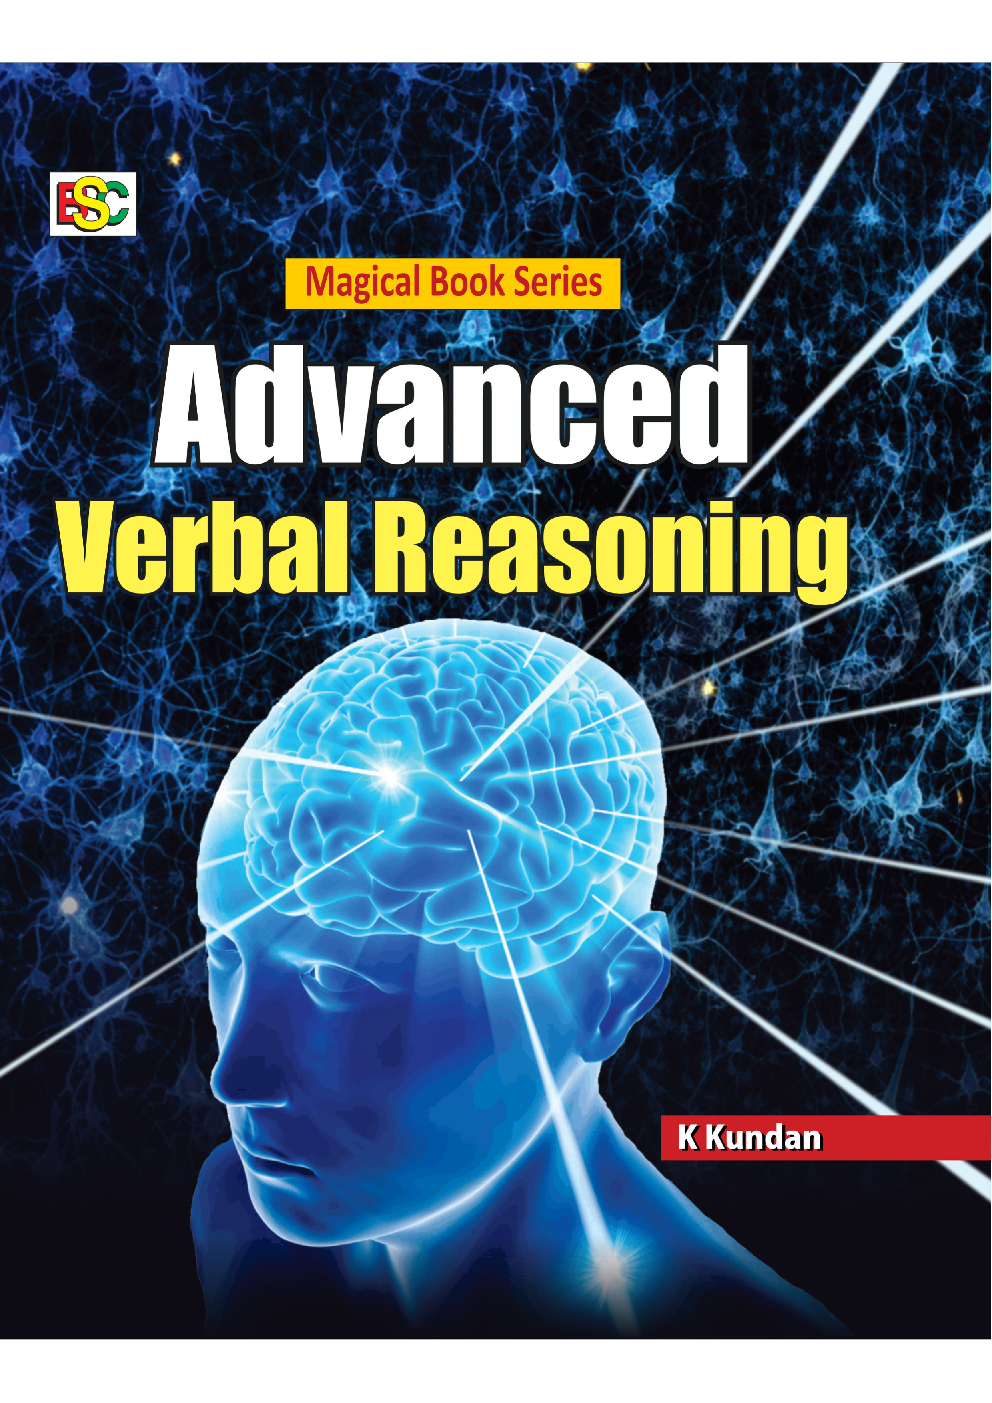 Magical Book Series: Advanced Verbal Reasoning - Page 1